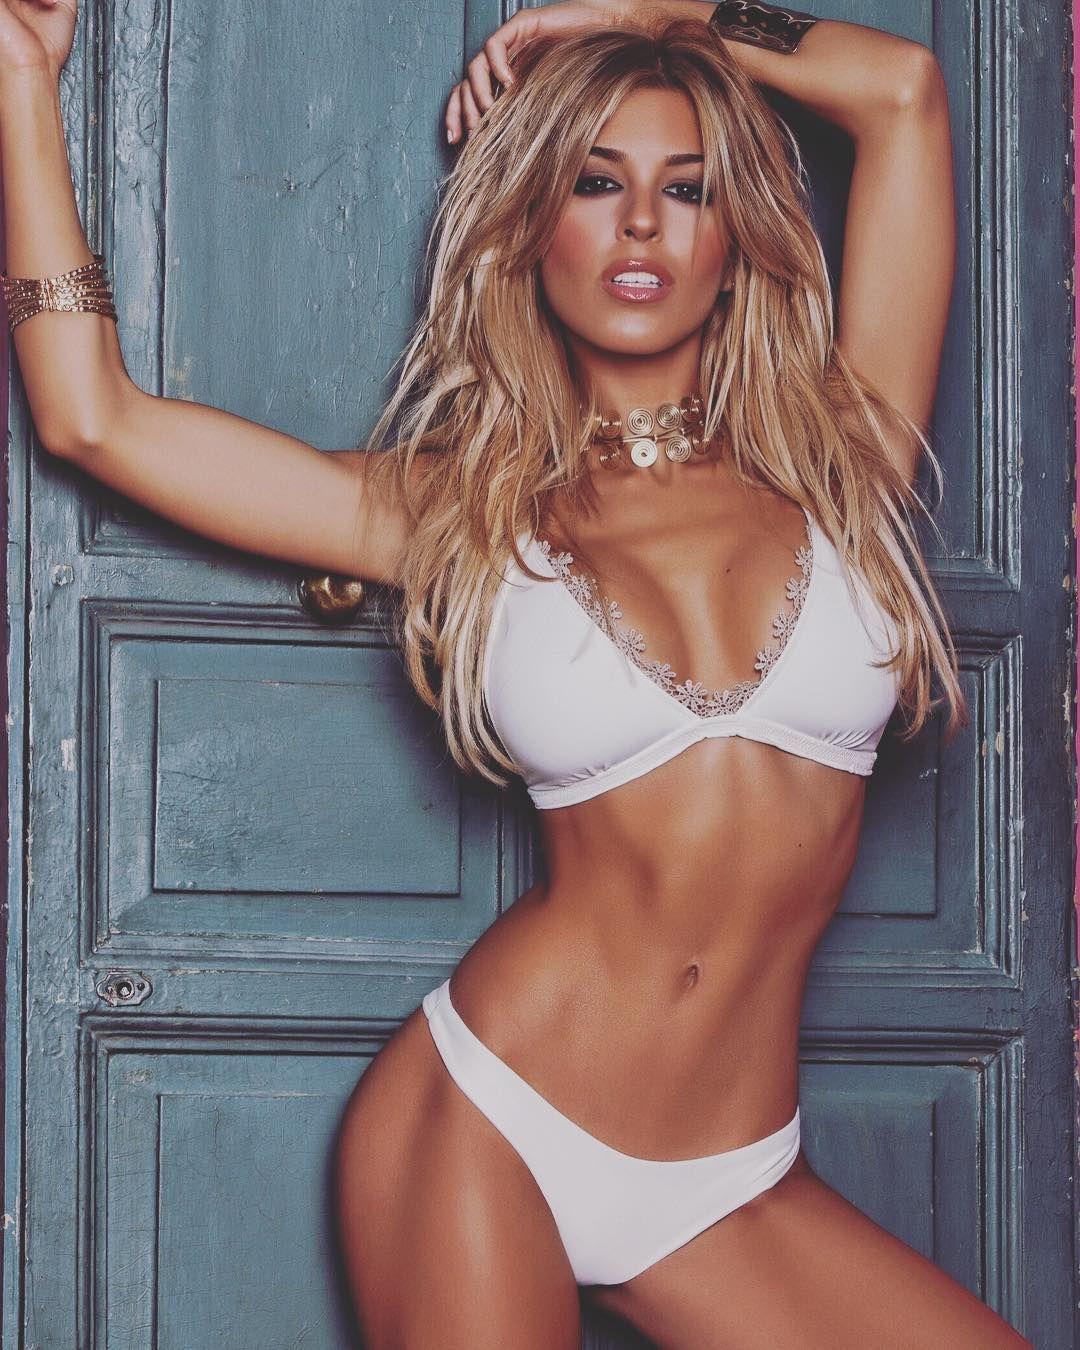 b23f7a13bc05 Oriana Marzoli bikini | Sexy girls en 2019 | Victoria's secret ...